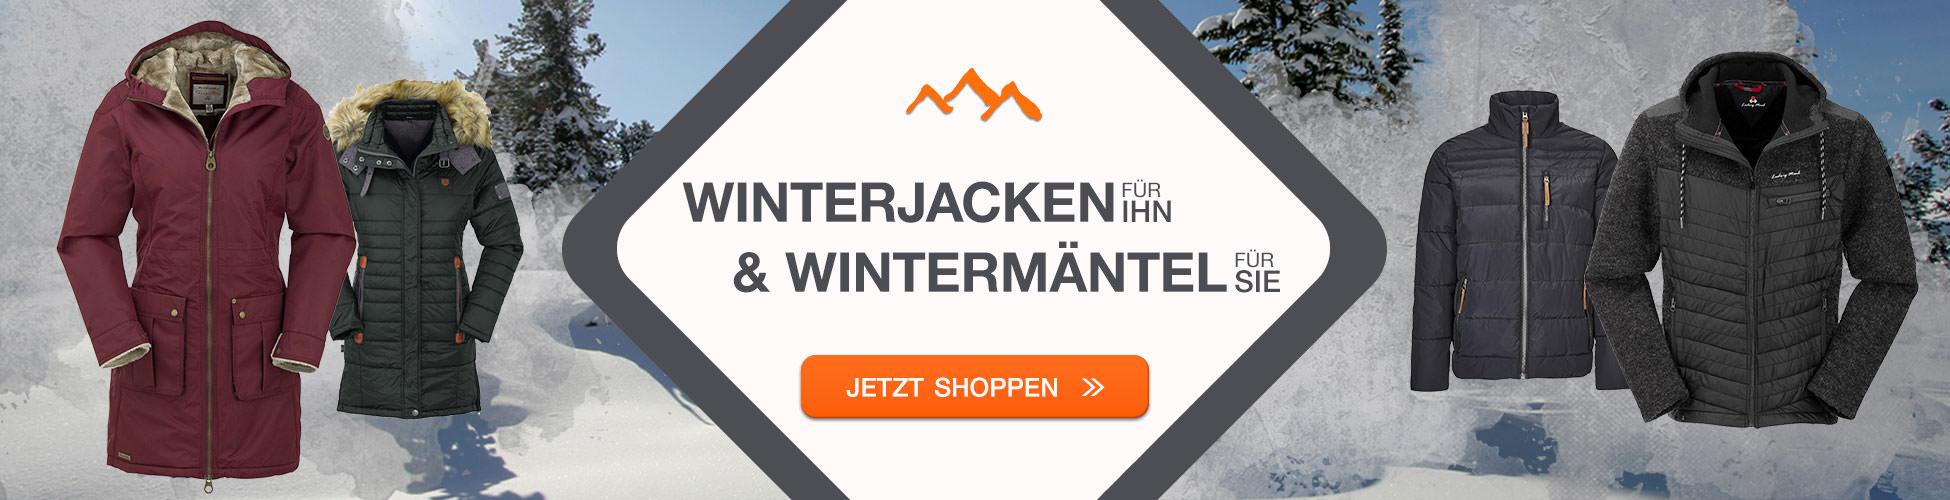 12_19_Winterjacken/Mäntel